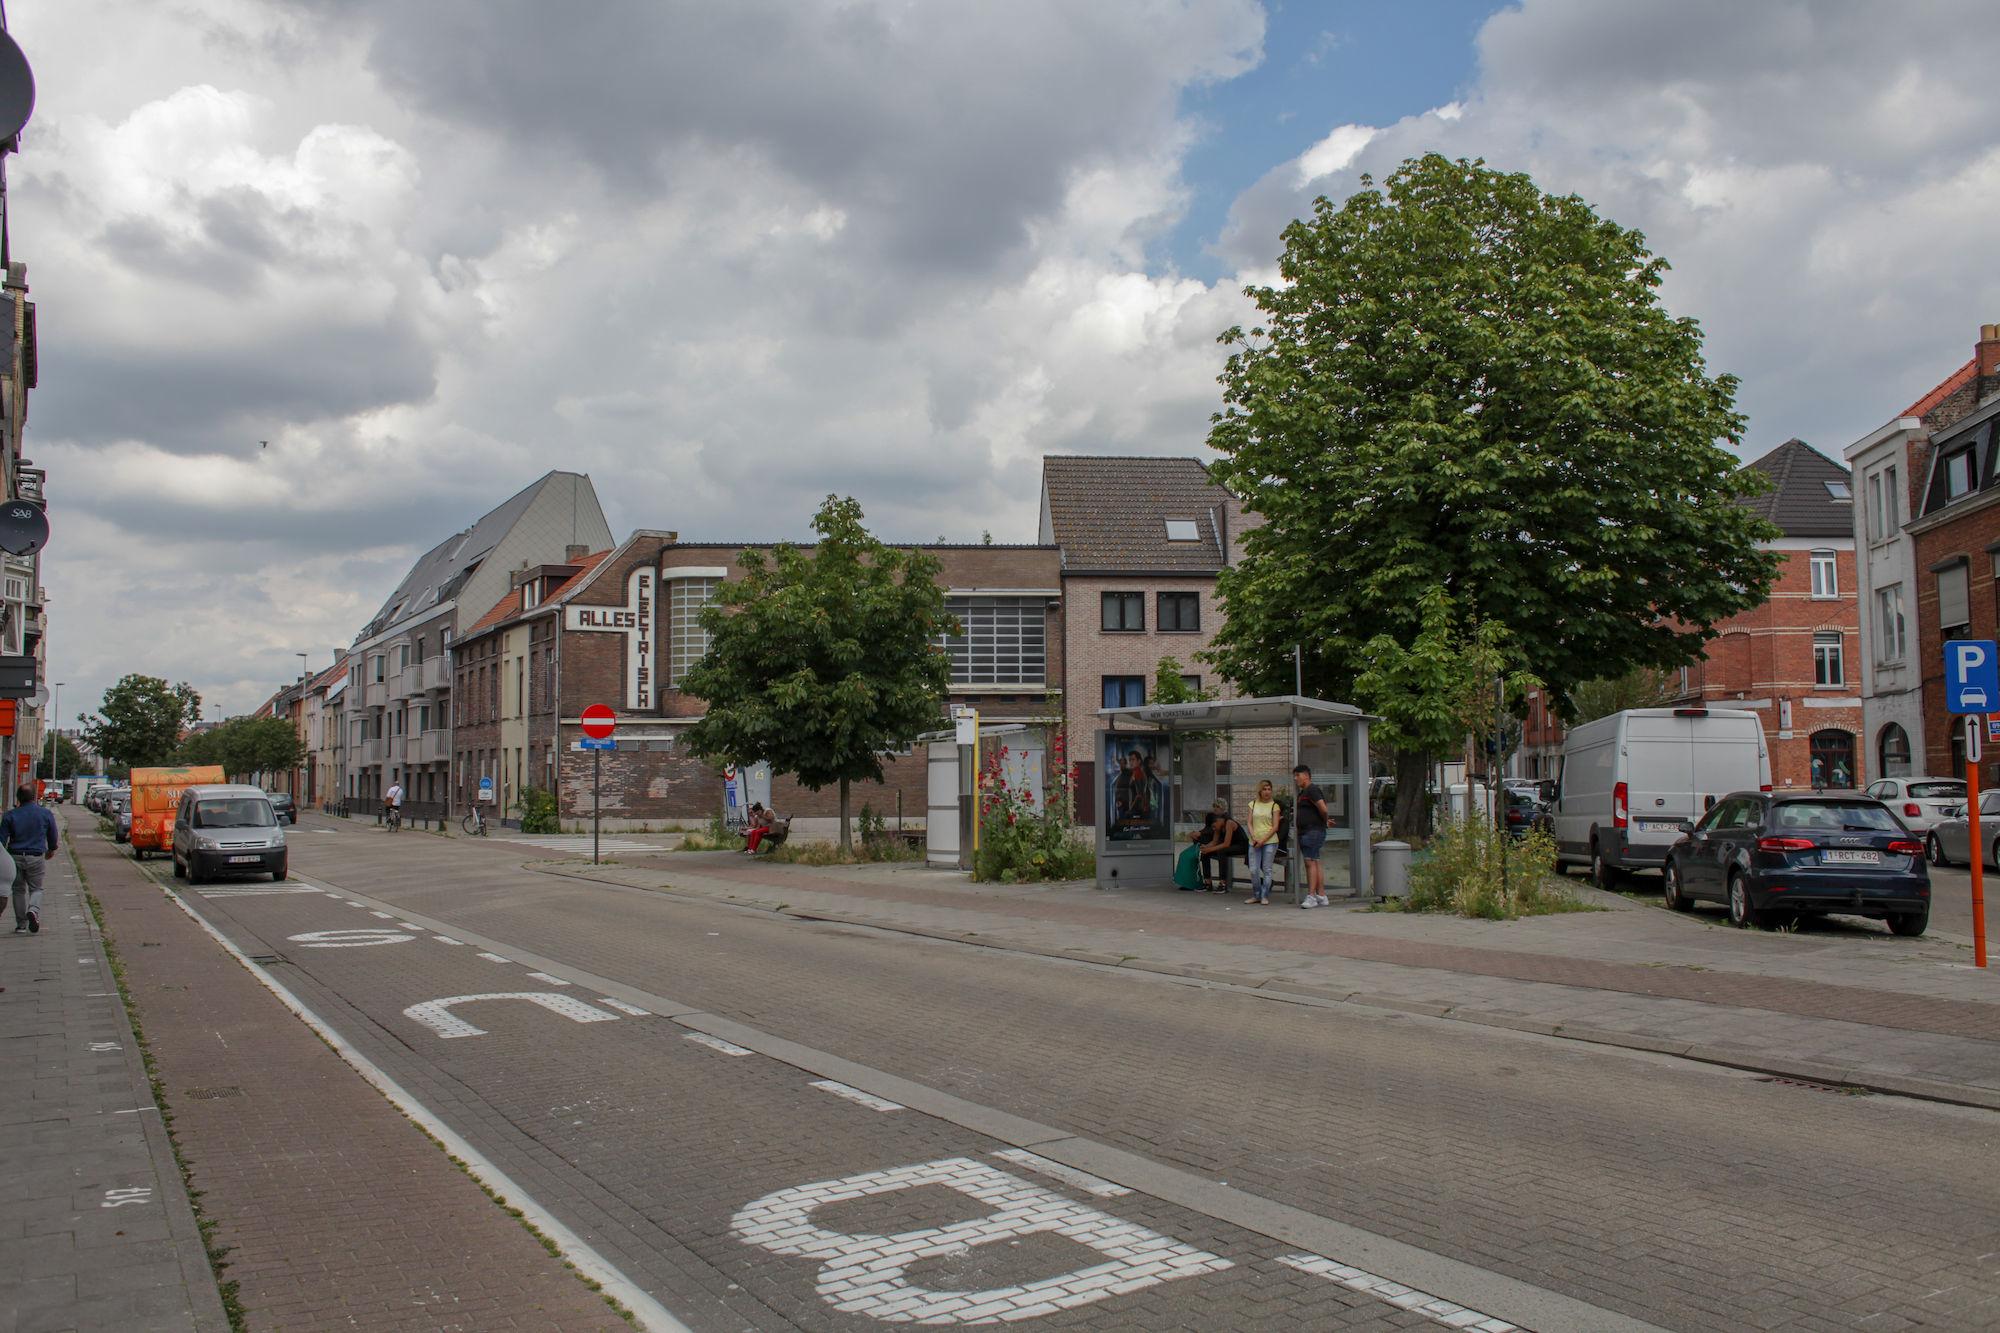 2019-07-02 Muide Meulestede prospectie Wannes_stadsvernieuwing_IMG_0311-2.jpg